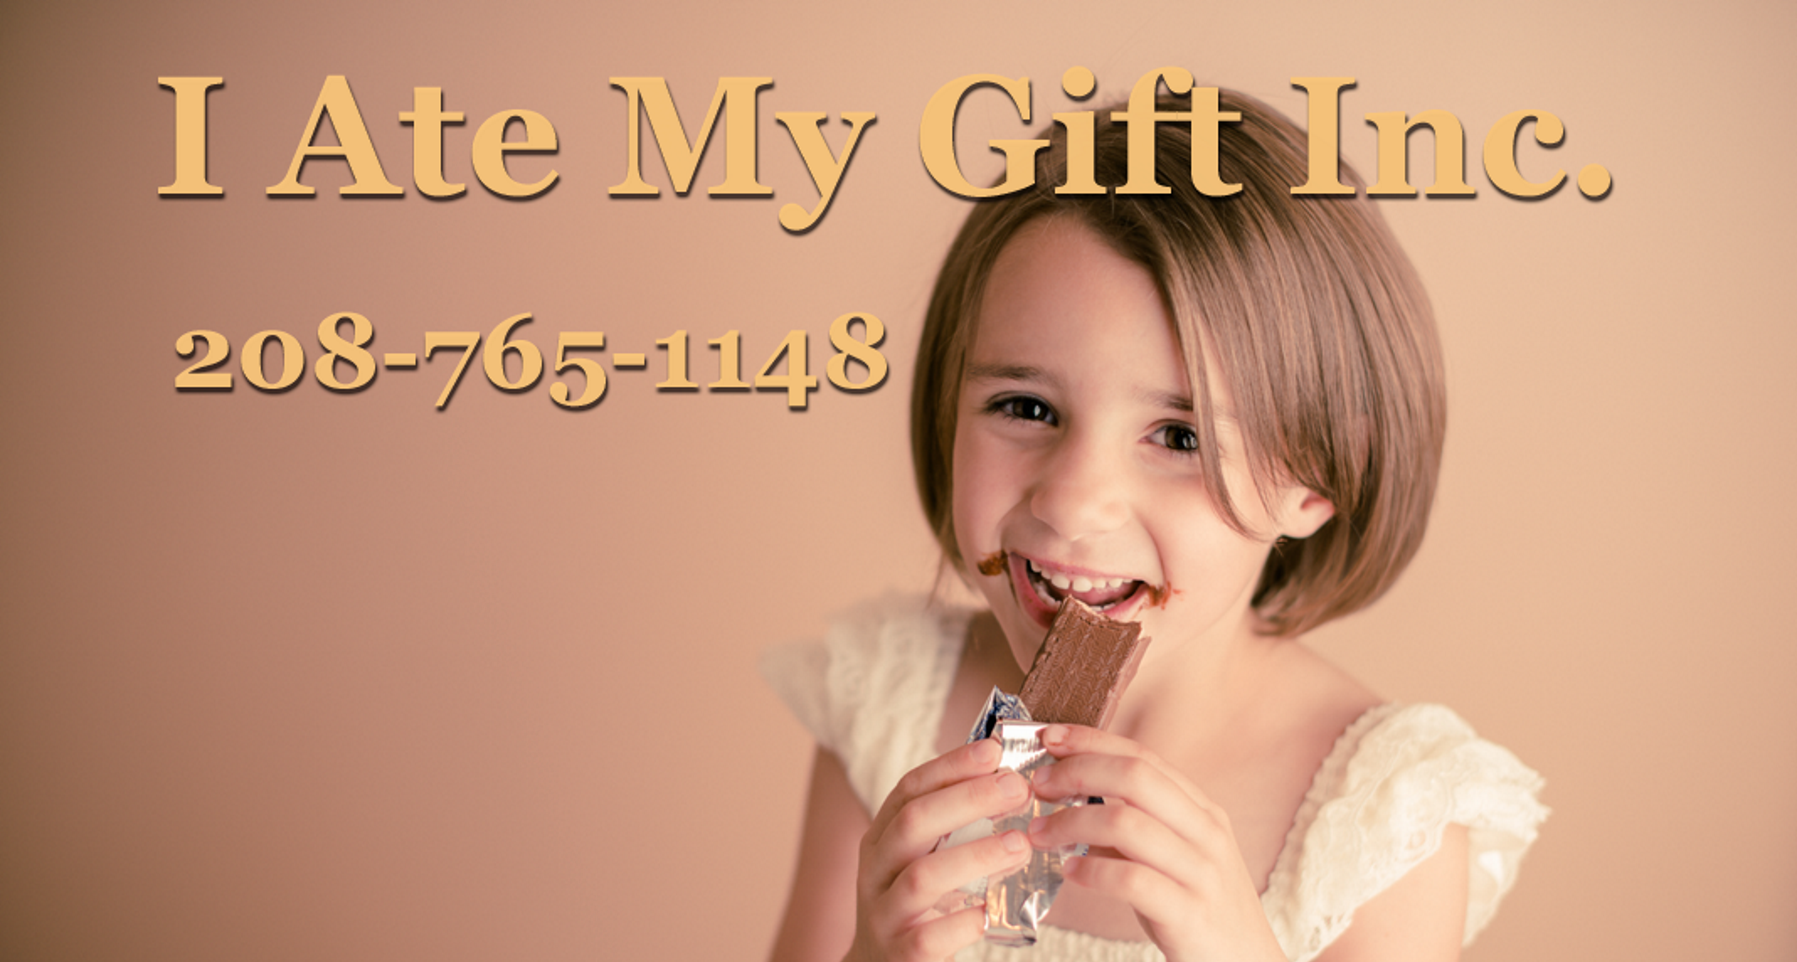 I Ate My Gift Inc.